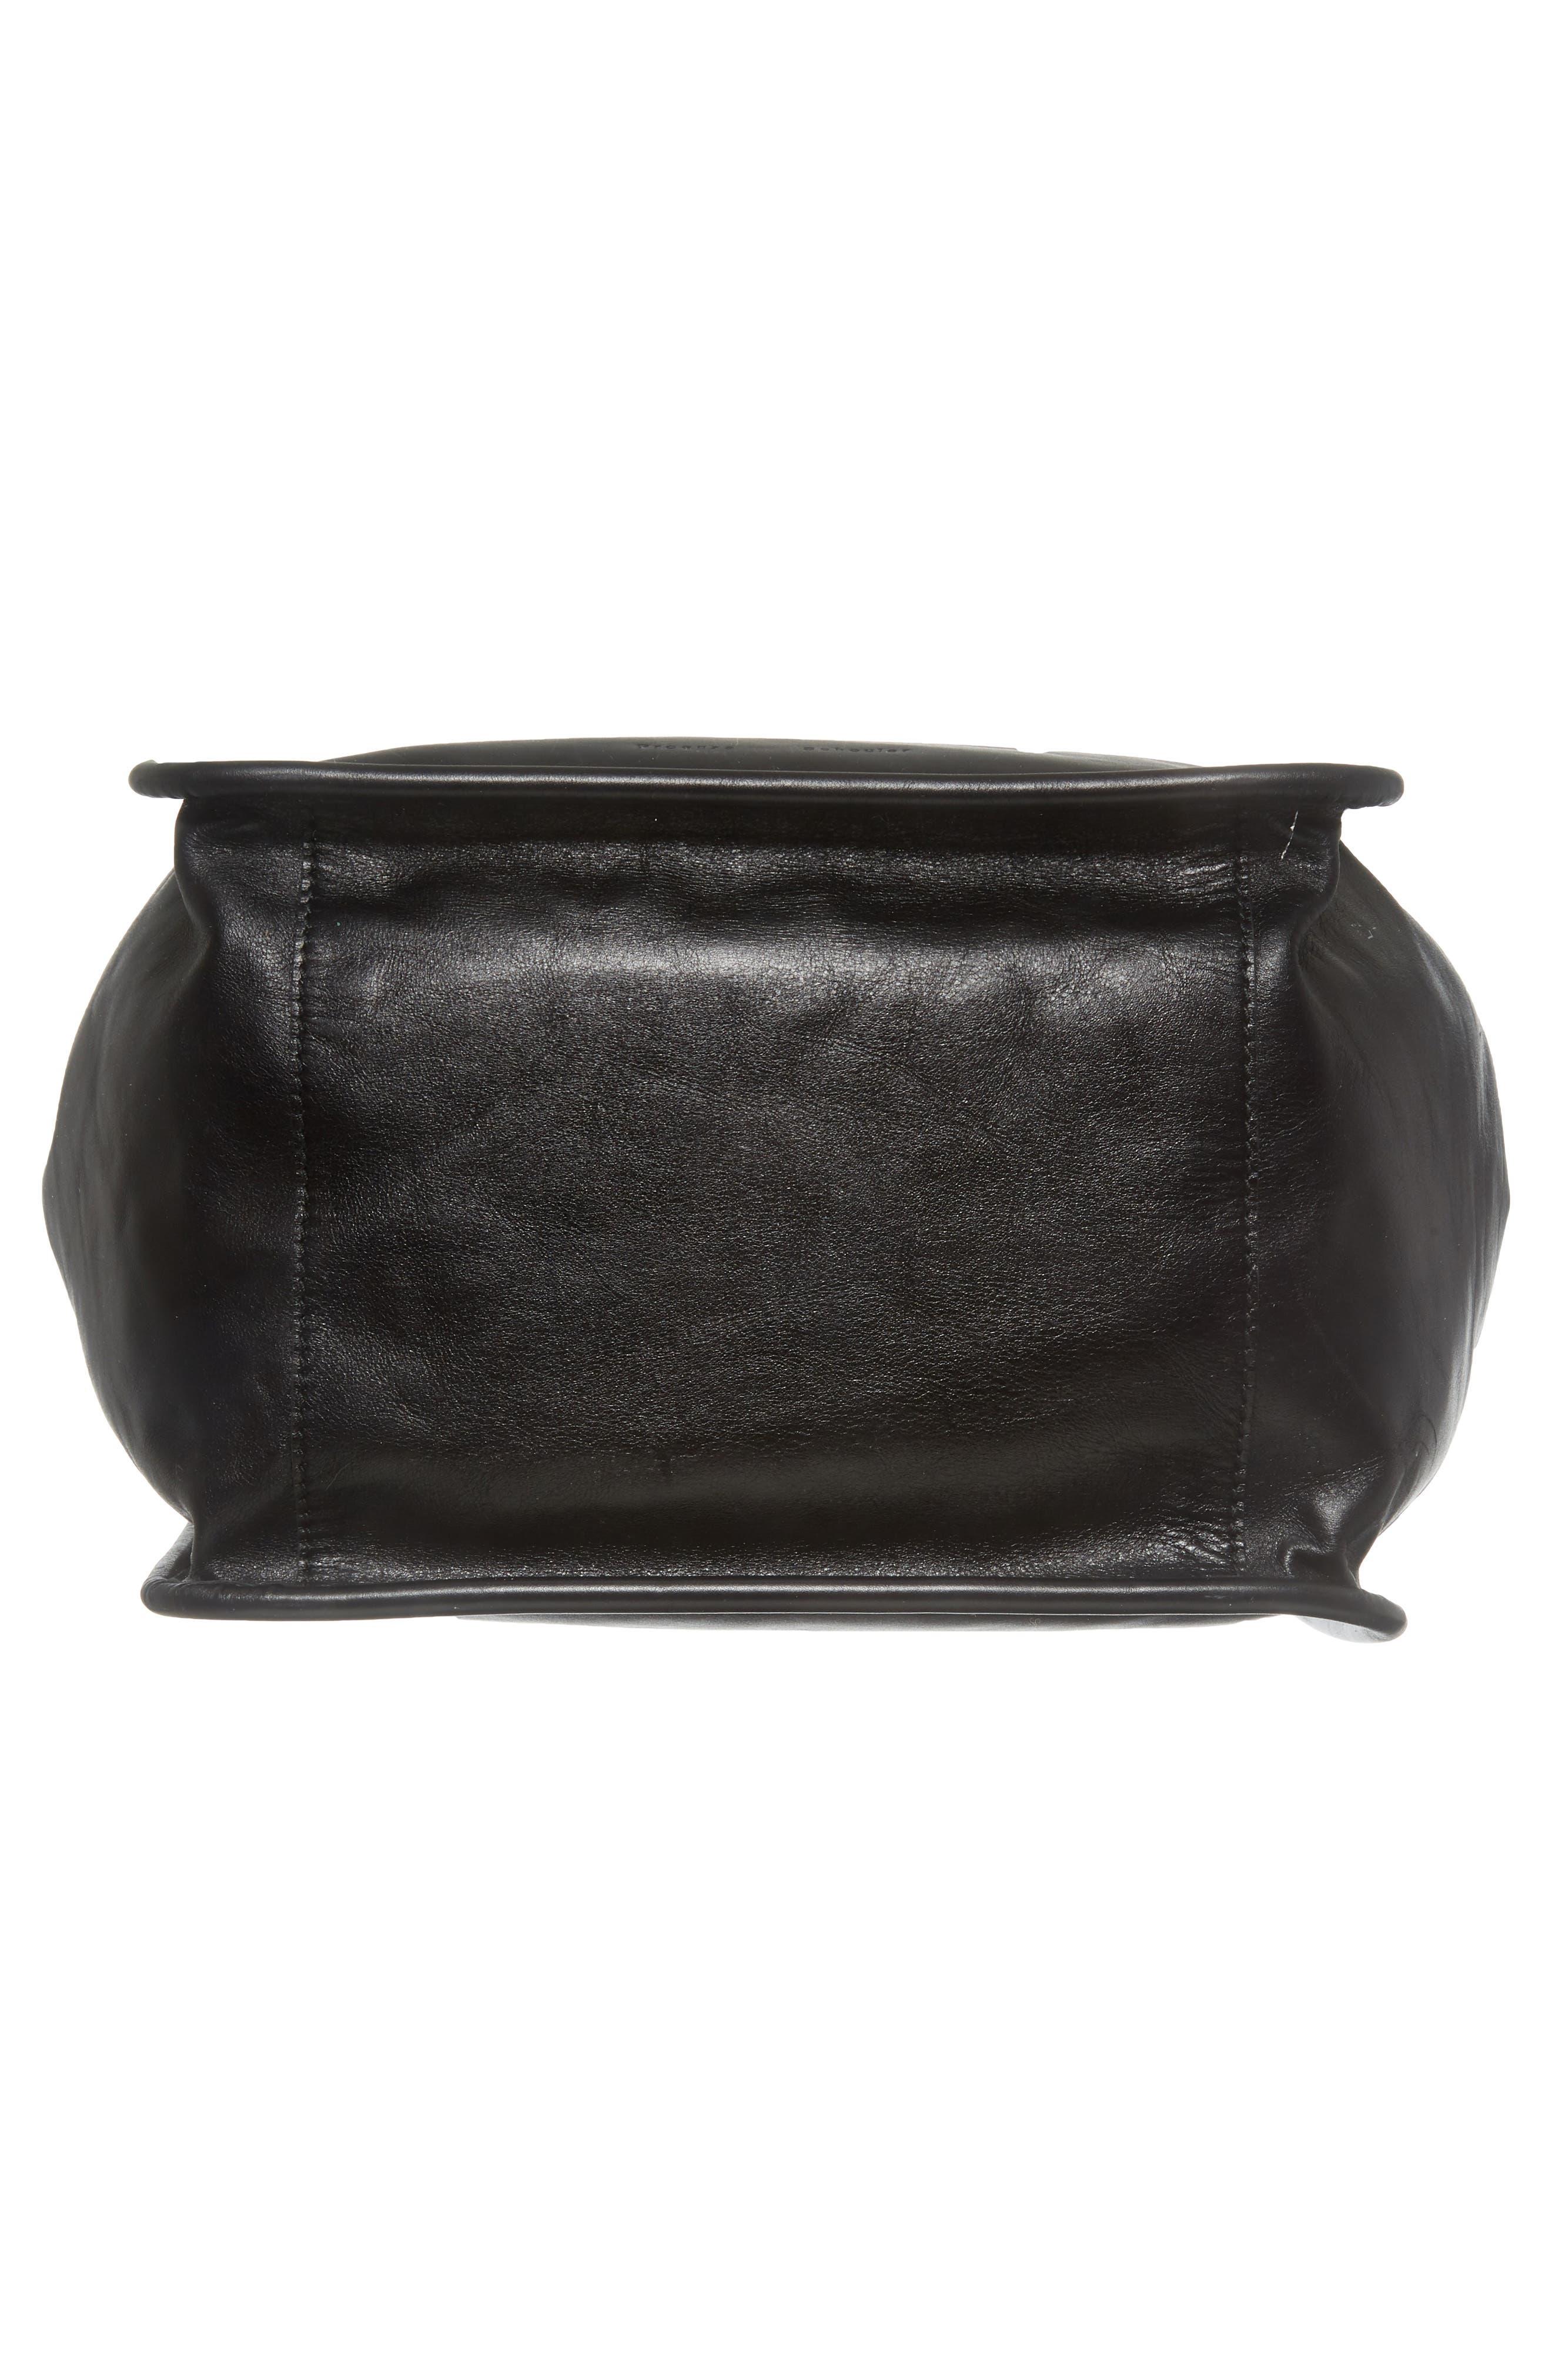 PROENZA SCHOULER, Large Calfskin Leather Tote, Alternate thumbnail 6, color, BLACK